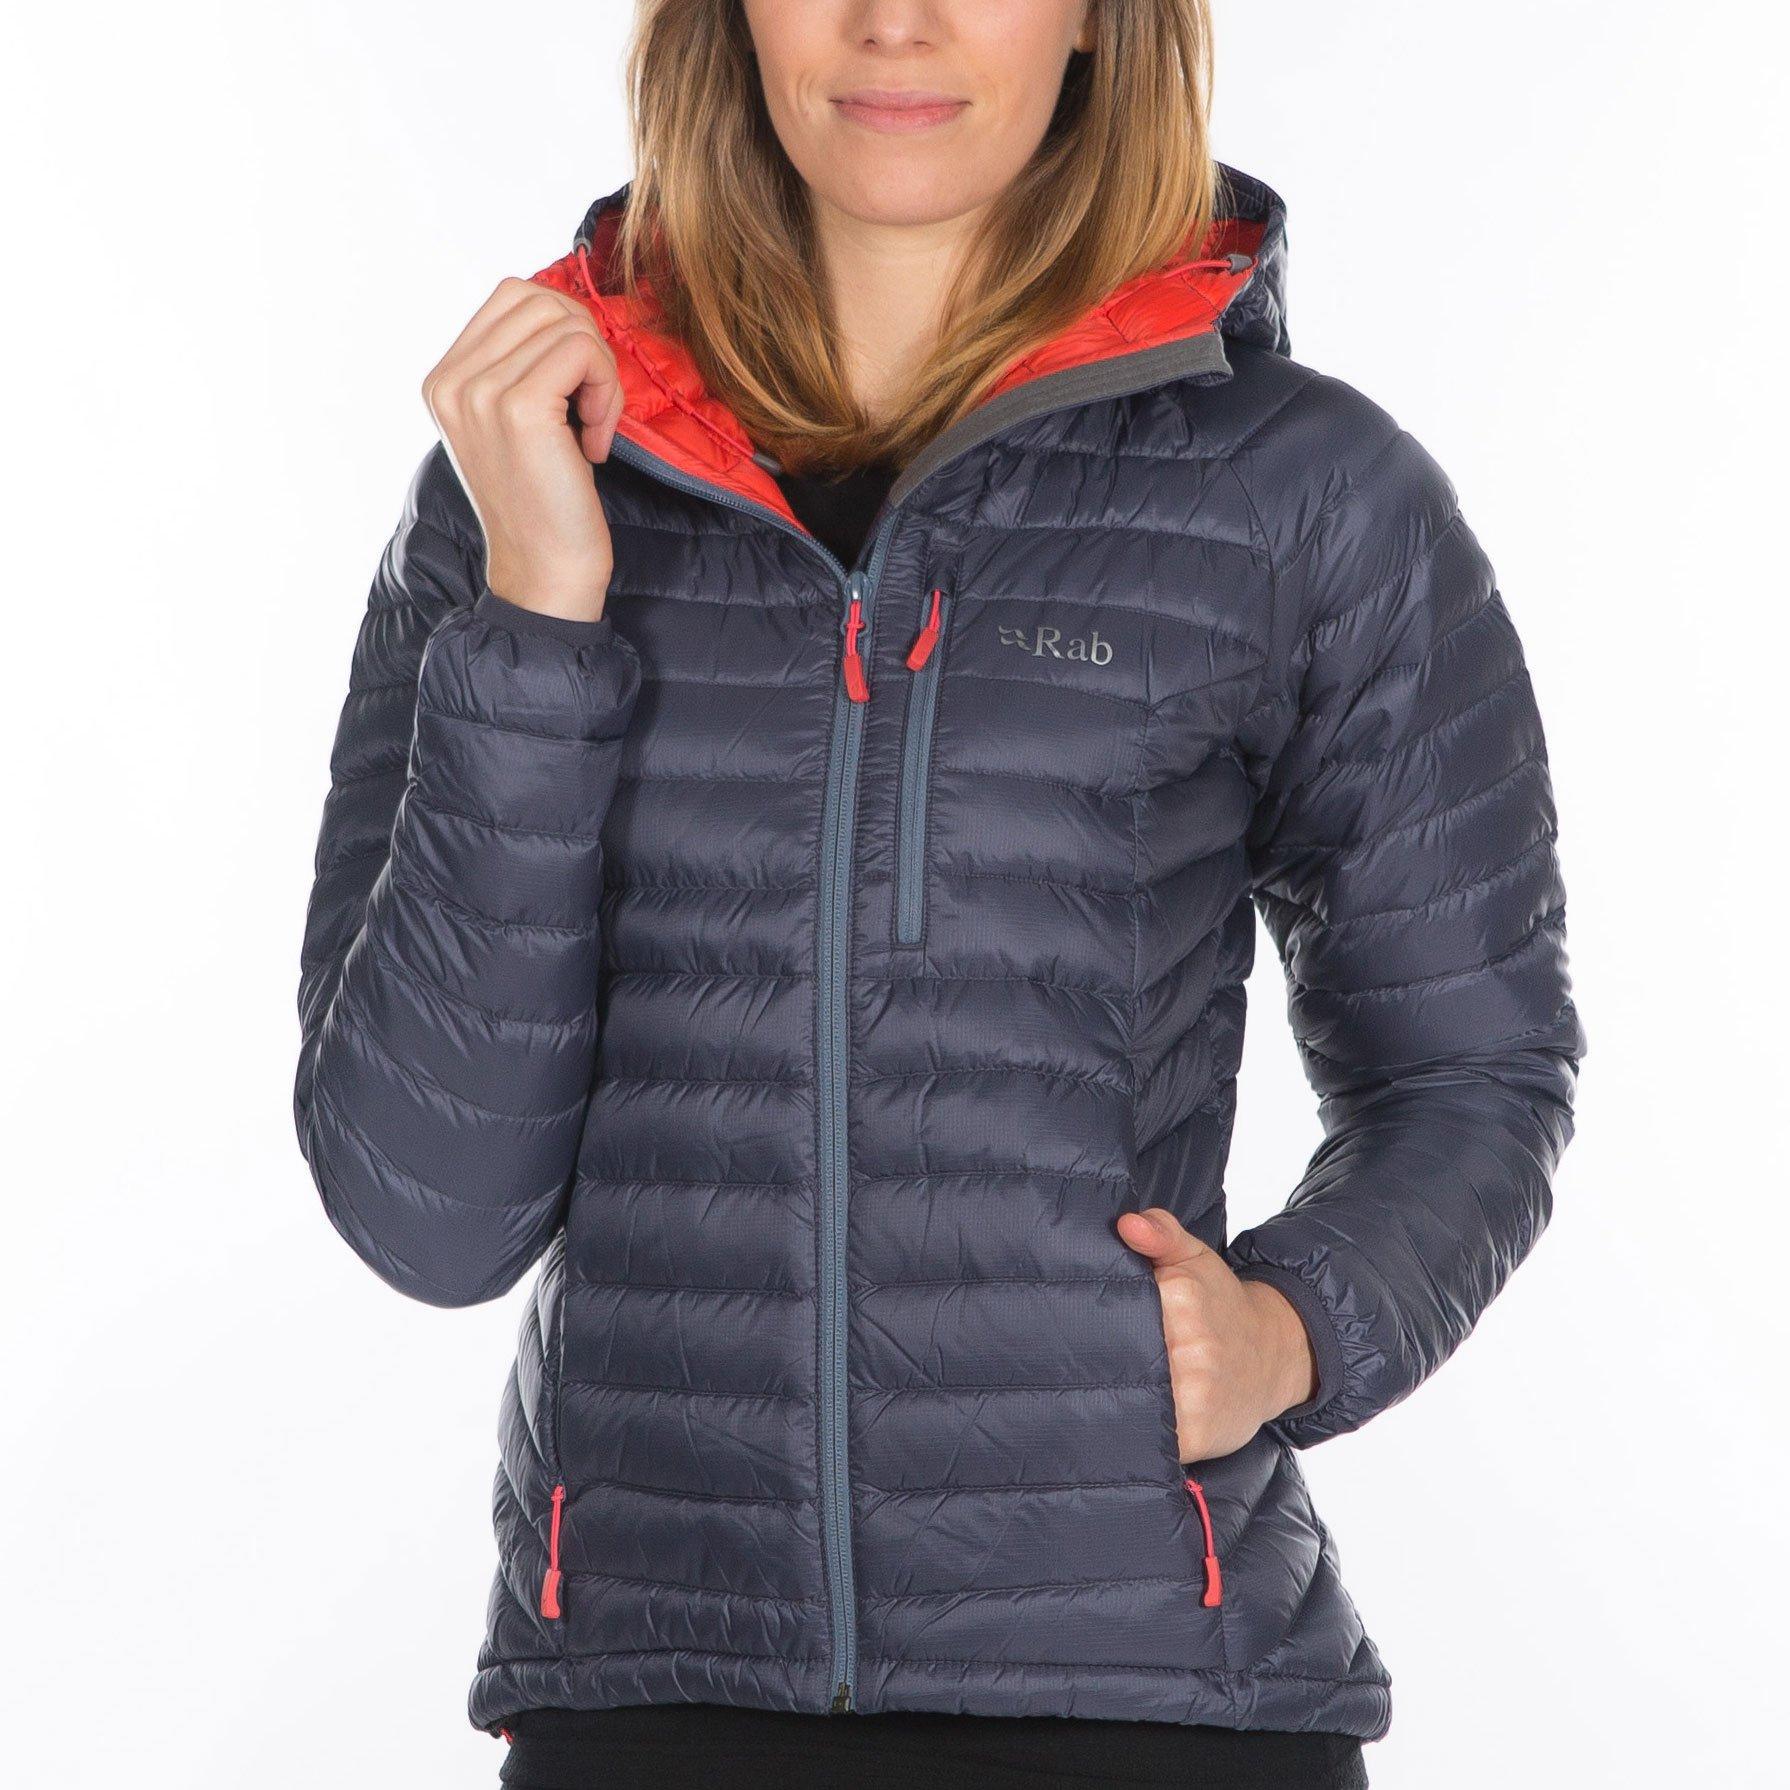 Rab puffa jacket womens